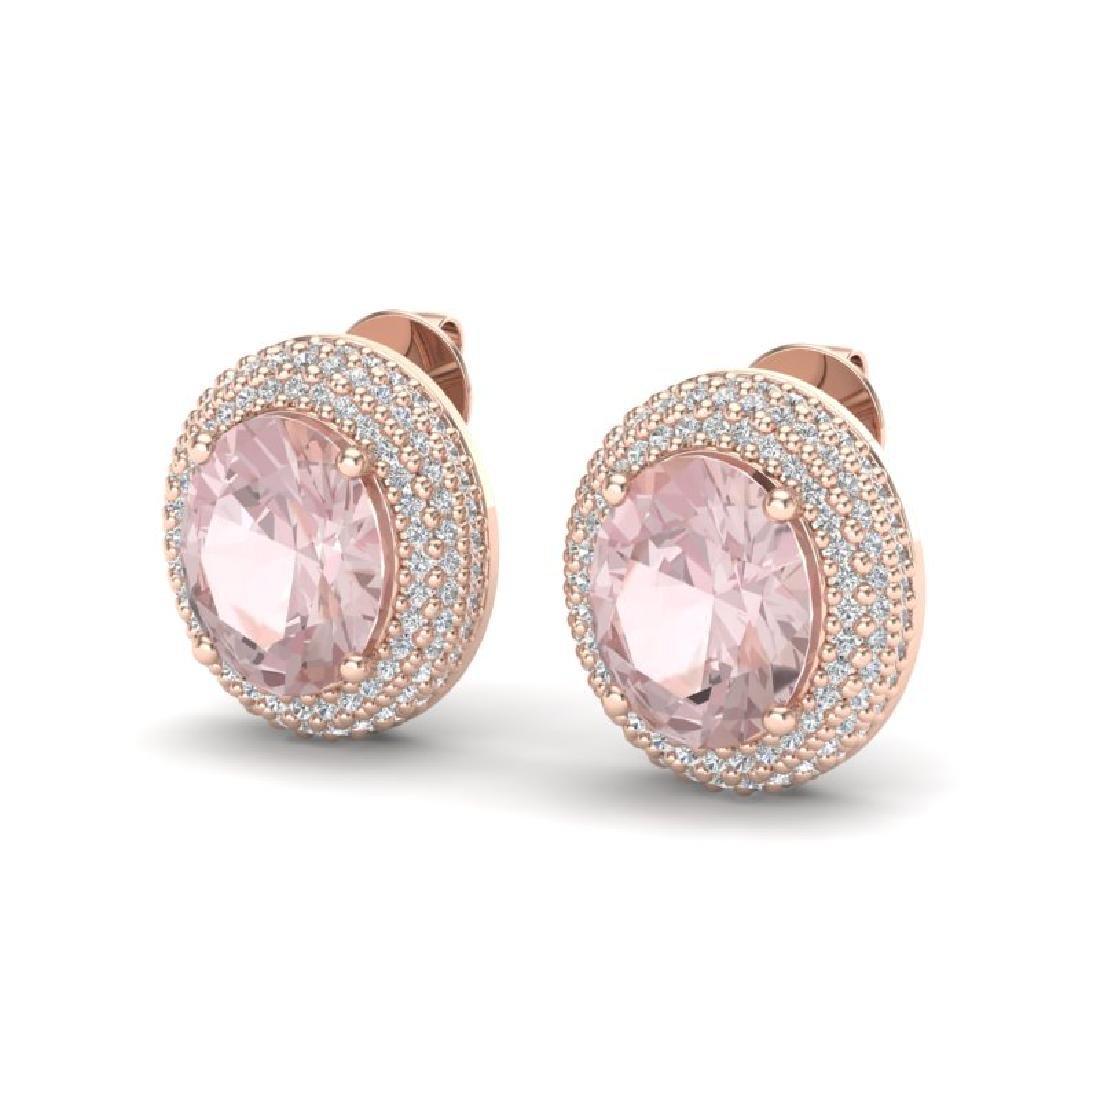 9 CTW Morganite & Micro Pave VS/SI Diamond Earrings 14K